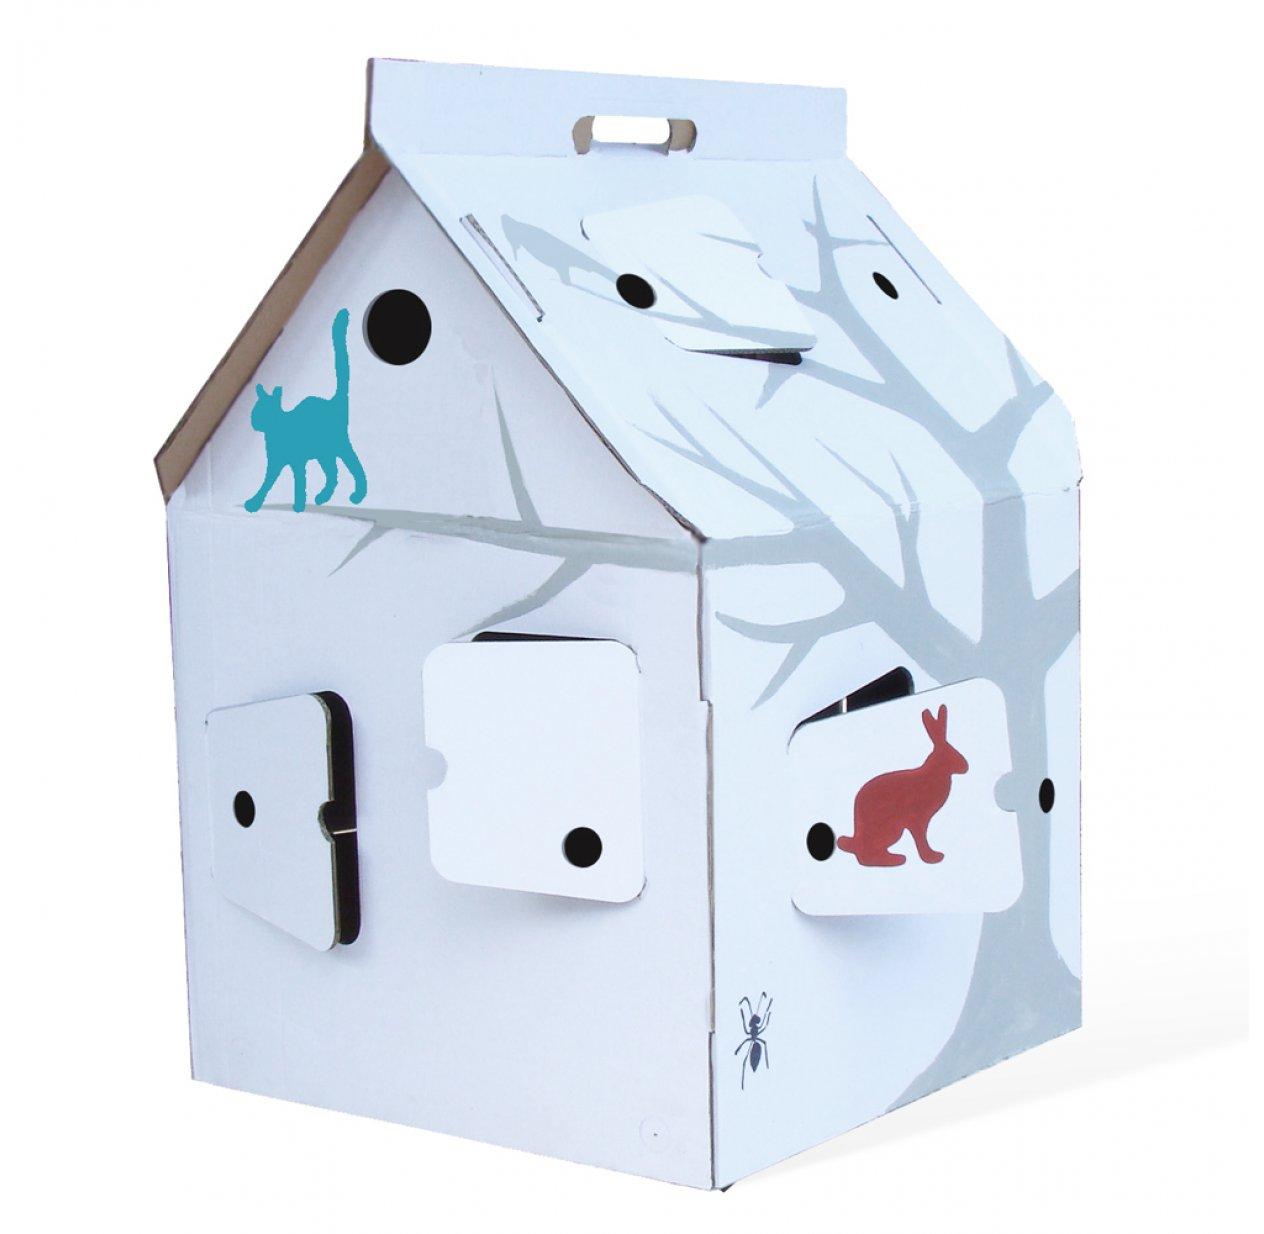 casa cabana maison en carton avec motifs studio roof. Black Bedroom Furniture Sets. Home Design Ideas